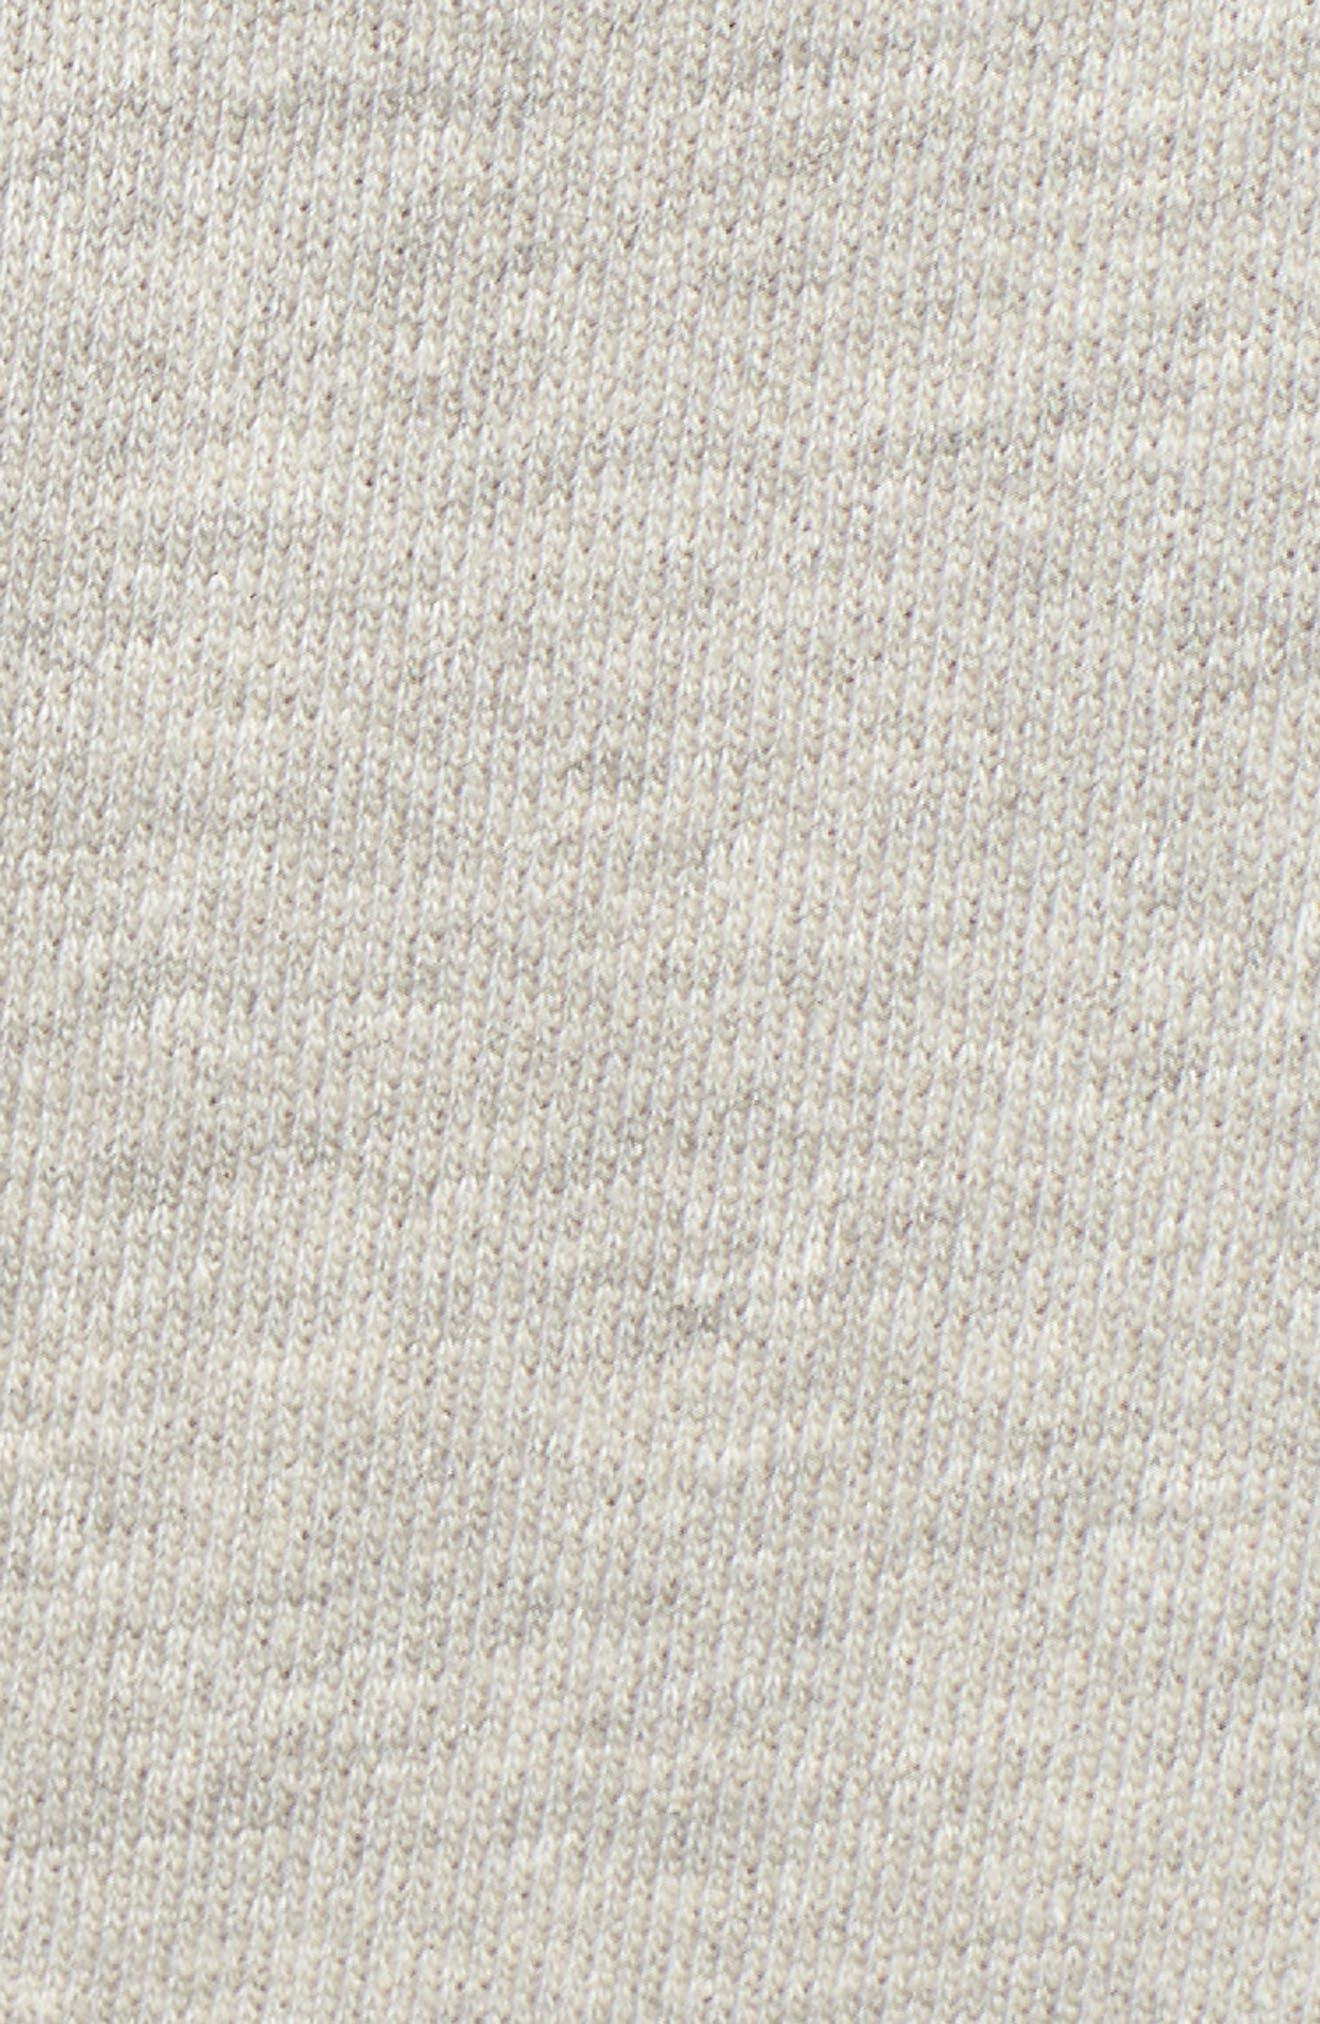 Off-Duty Cotton Knit Drawstring Skirt,                             Alternate thumbnail 5, color,